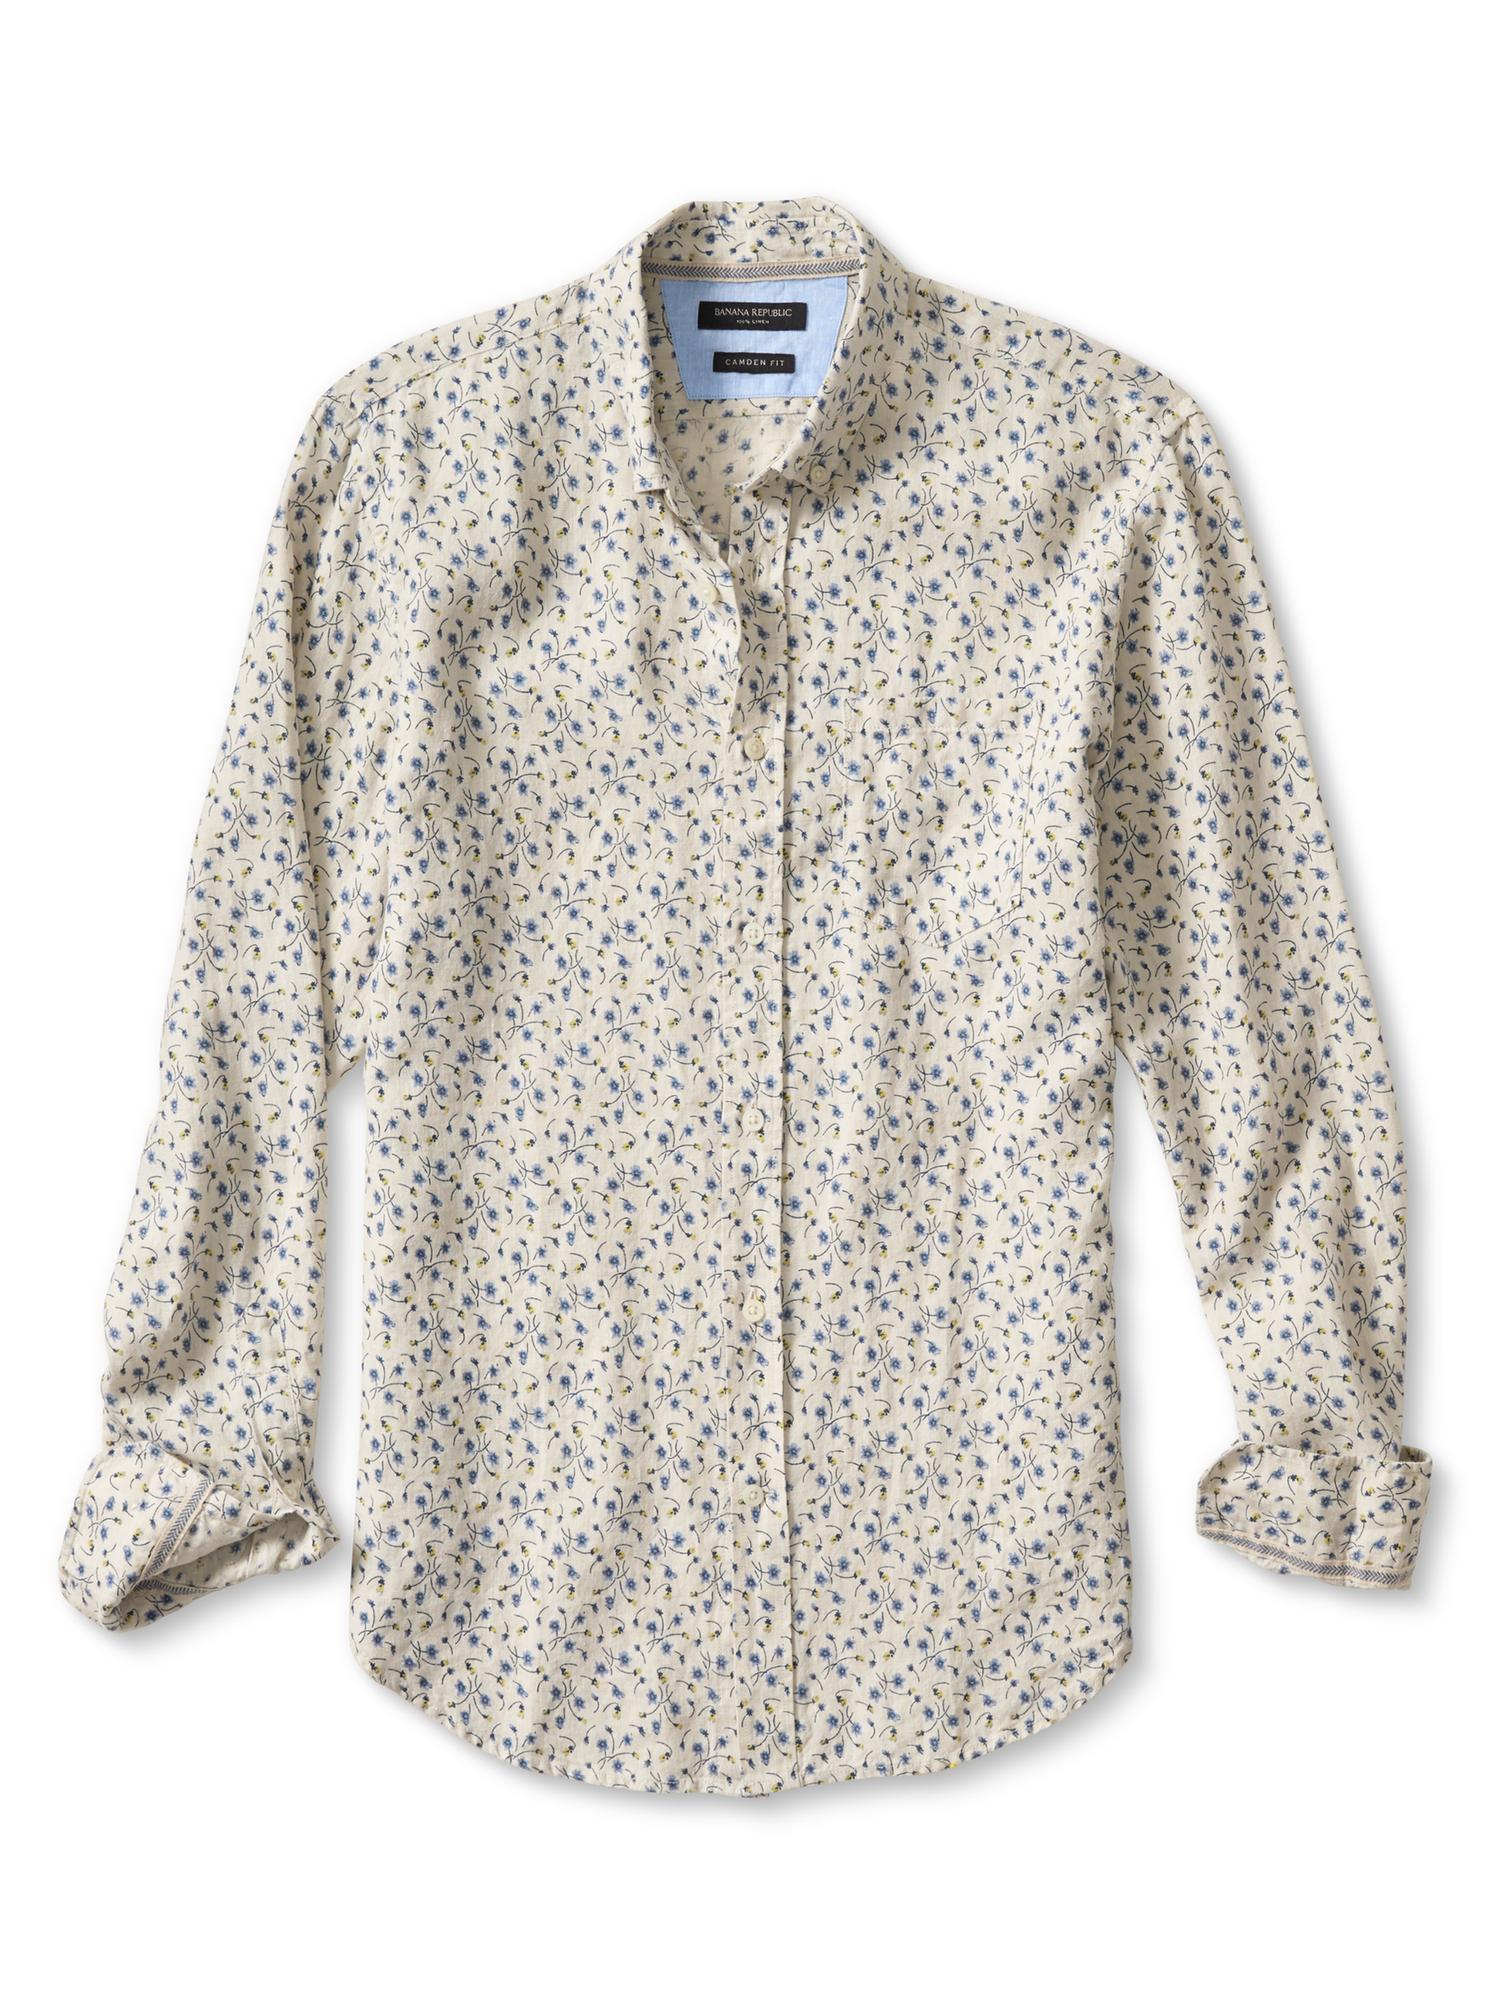 Banana Republic Camden Fit Floral Linen Shirt In Natural